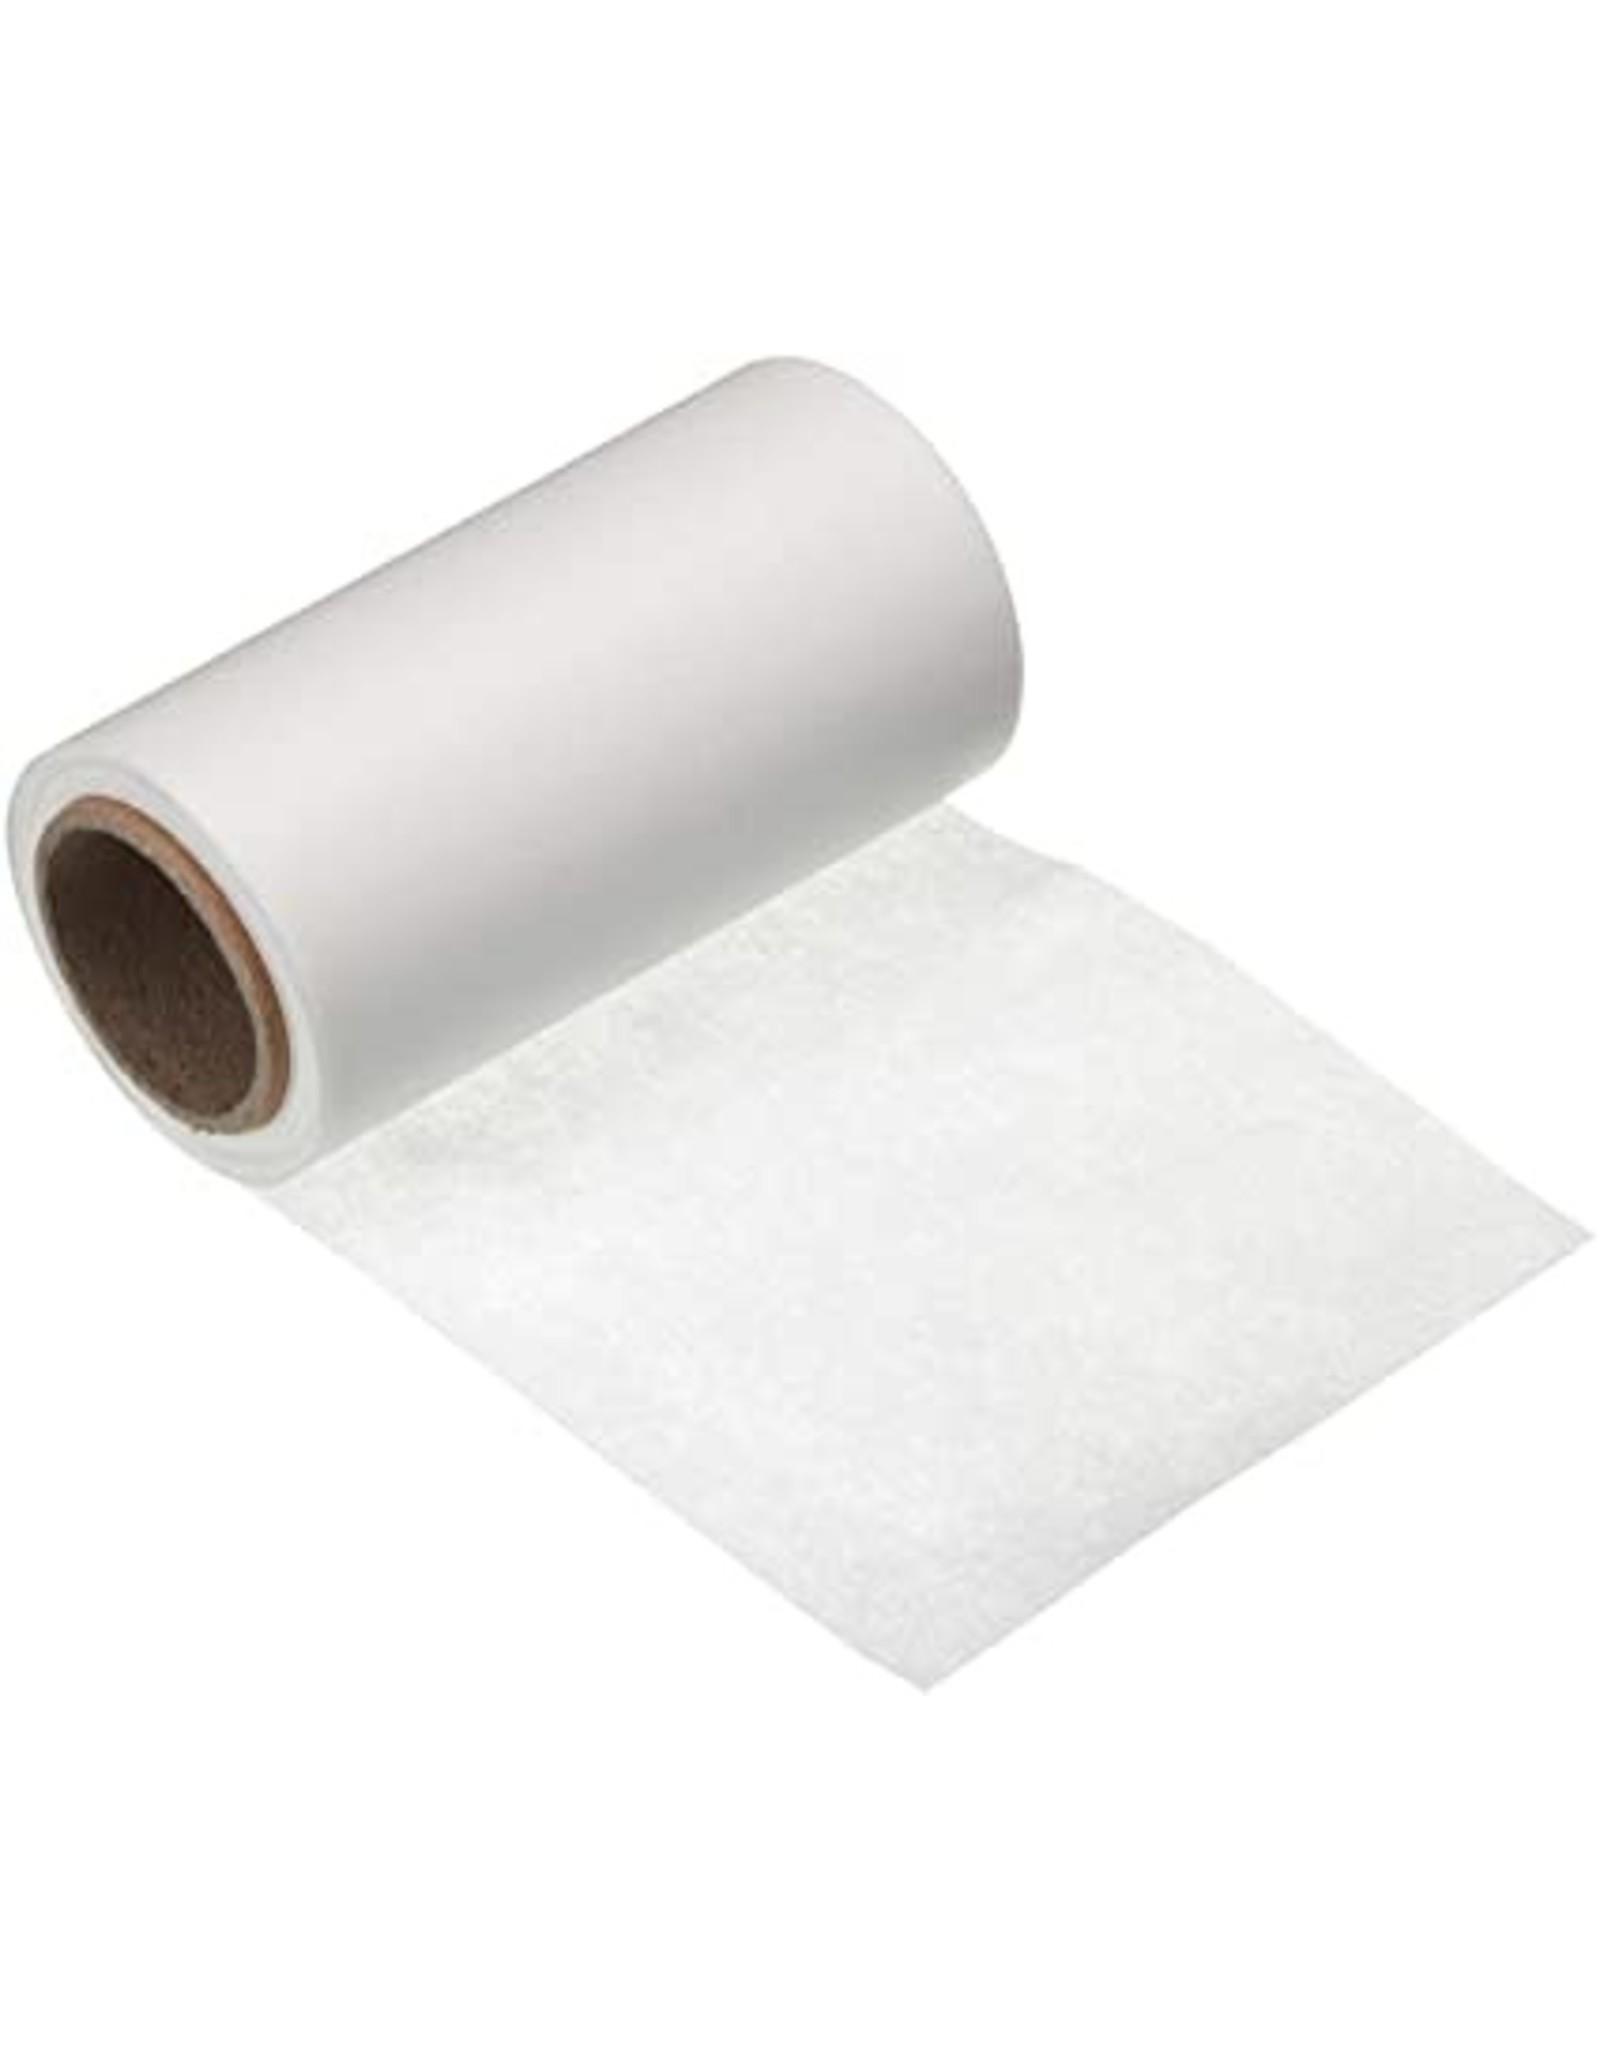 Kitchencraft Rol bakpapier smal 25m x 10cm met siliconen coating